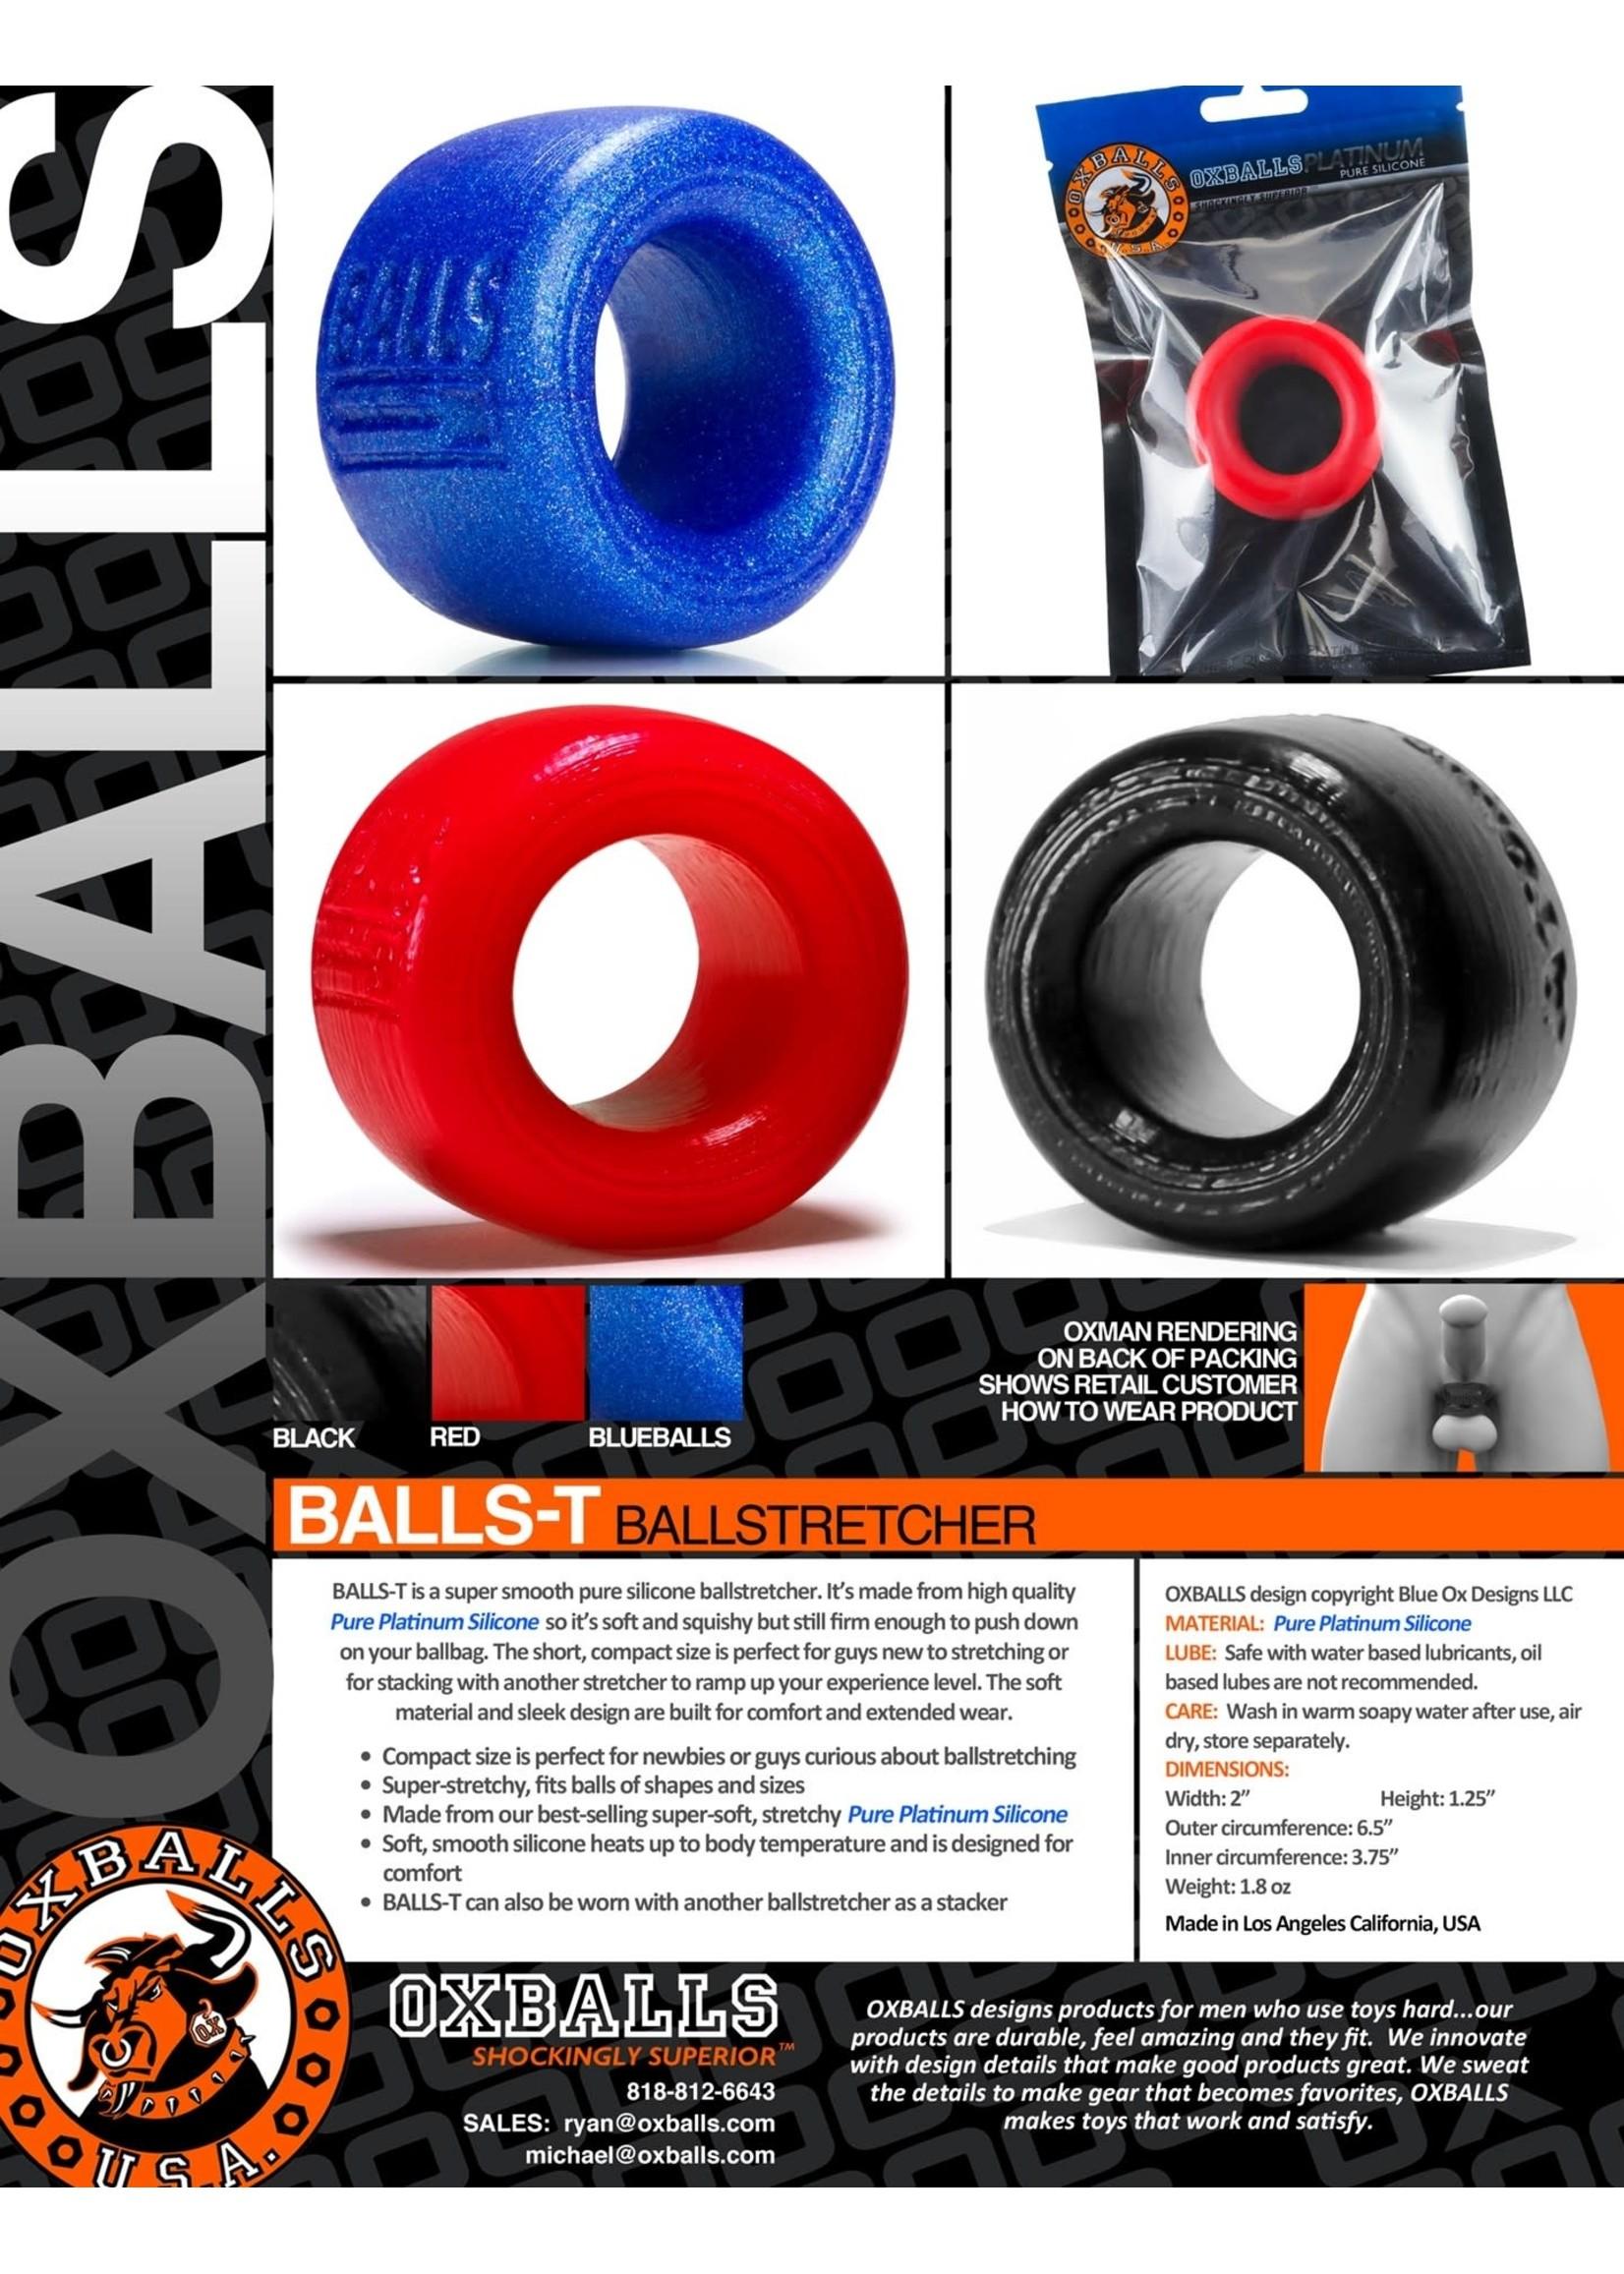 Oxballs OxBalls Balls-T